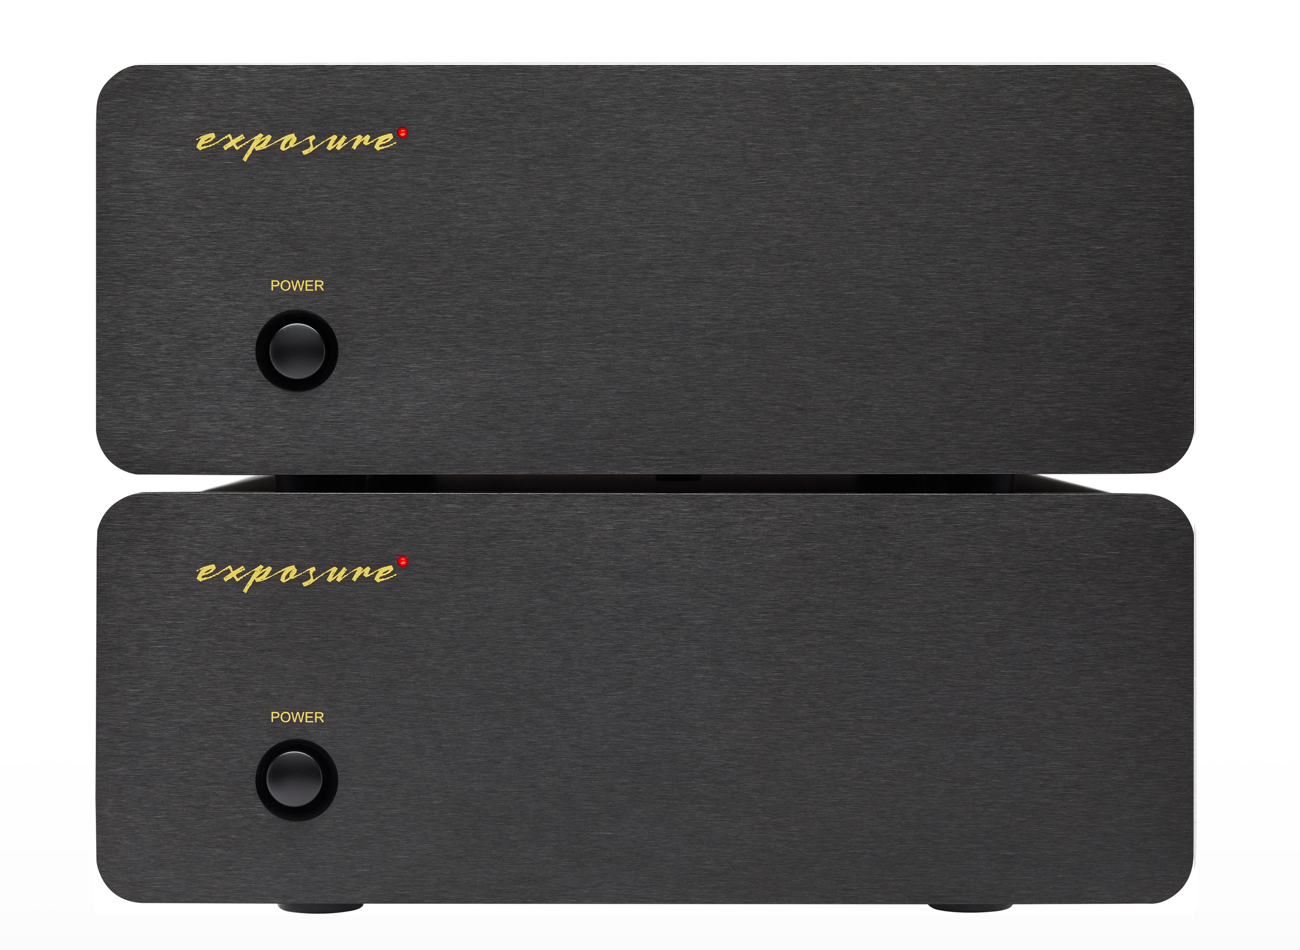 Exposure XM9 Mono Power Amplifier Barevné provedení: černé